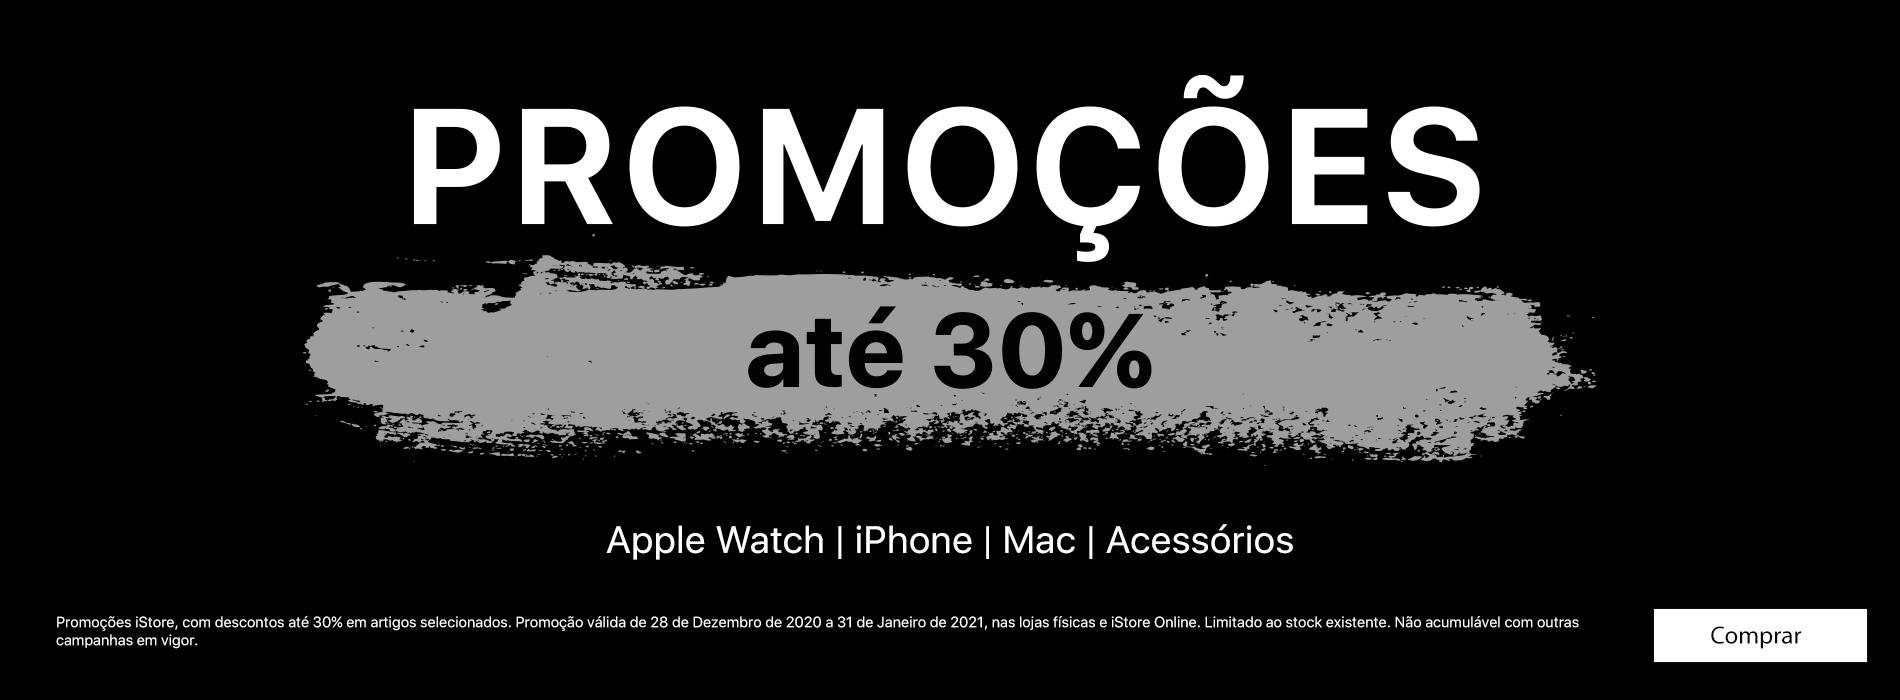 Homepage Slideshow - Promocoes 2020